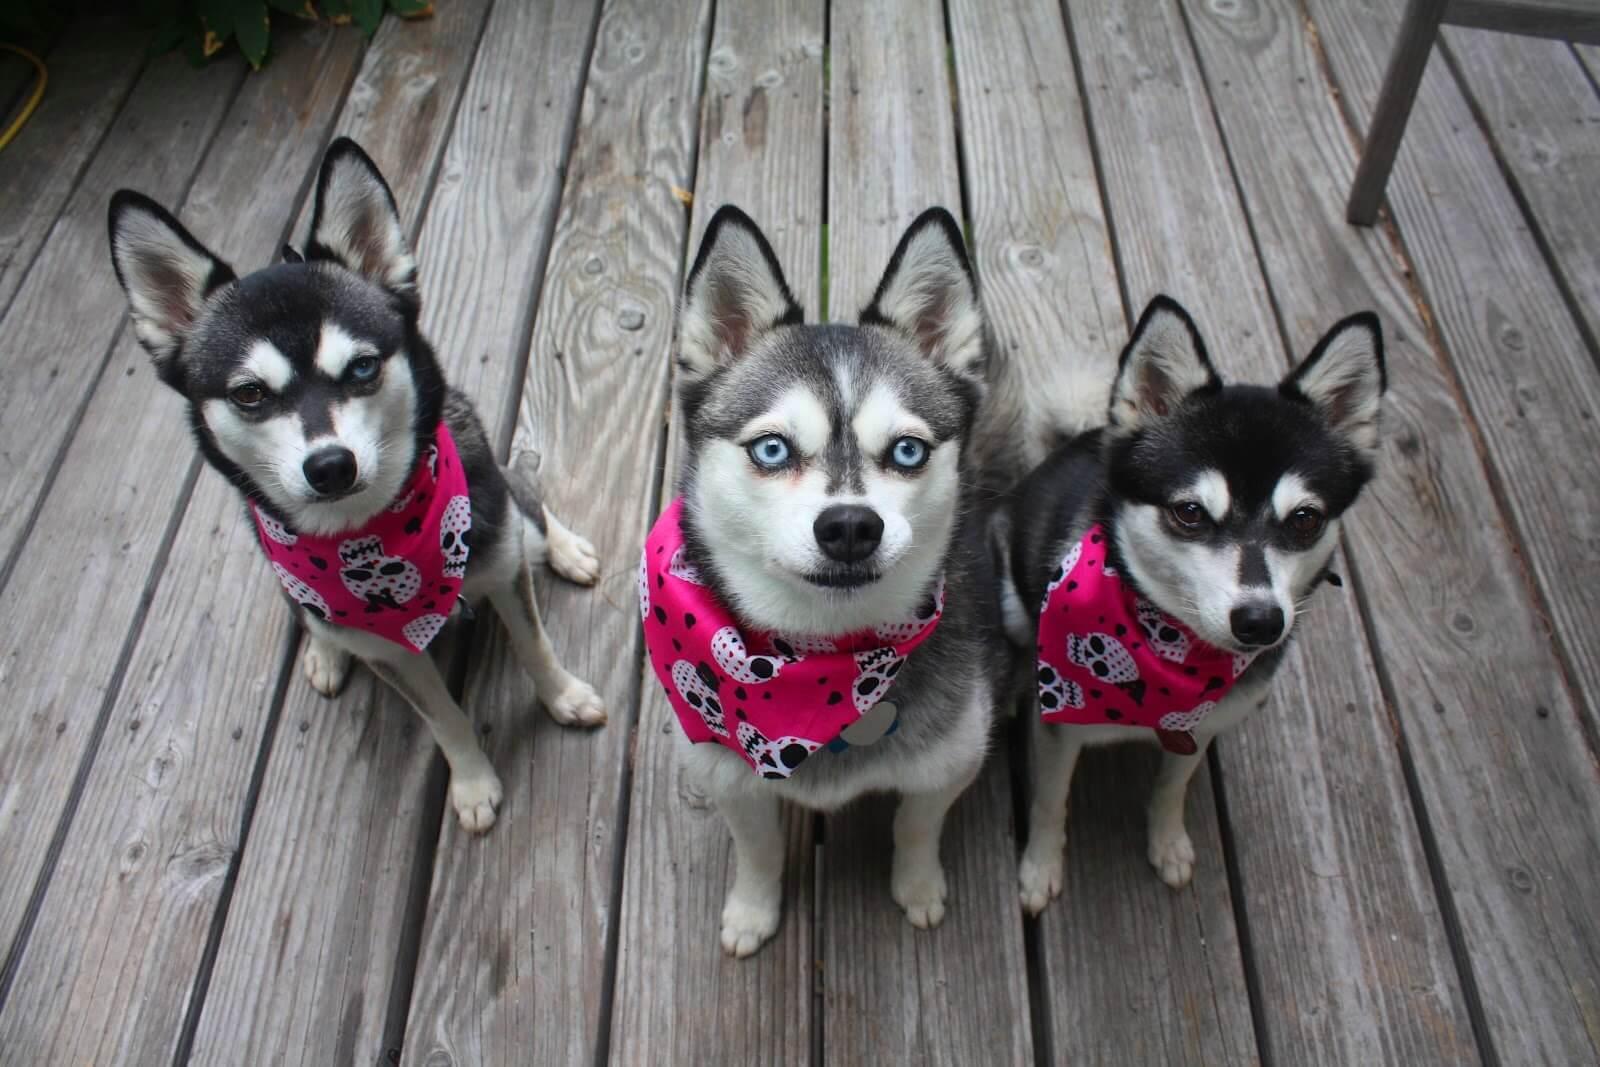 Аляскинский кли кай (мини-хаски) - все о породе от а до я + отзывы и 100 фото